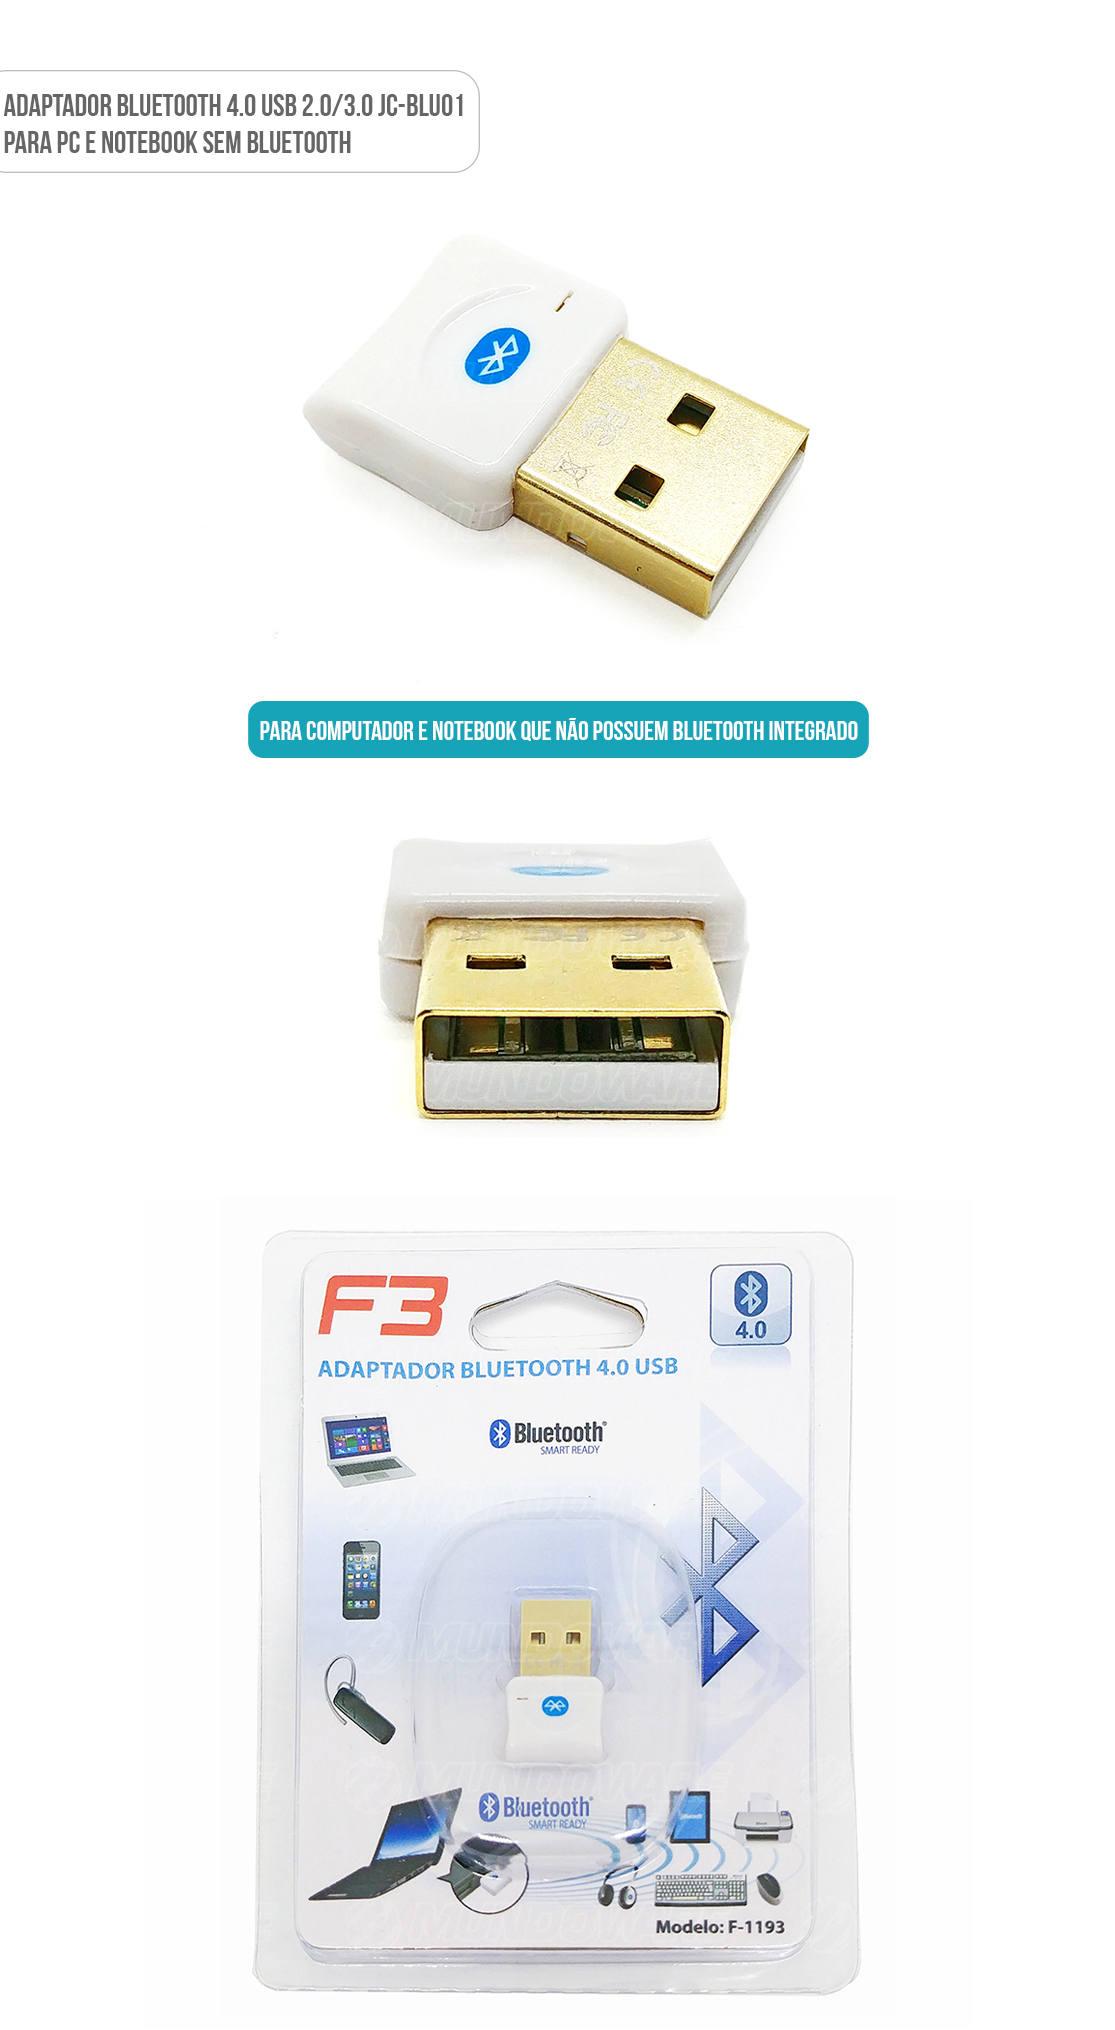 Adaptador Bluetooth 4.0 USB para PC Desktop Note JCBLU01